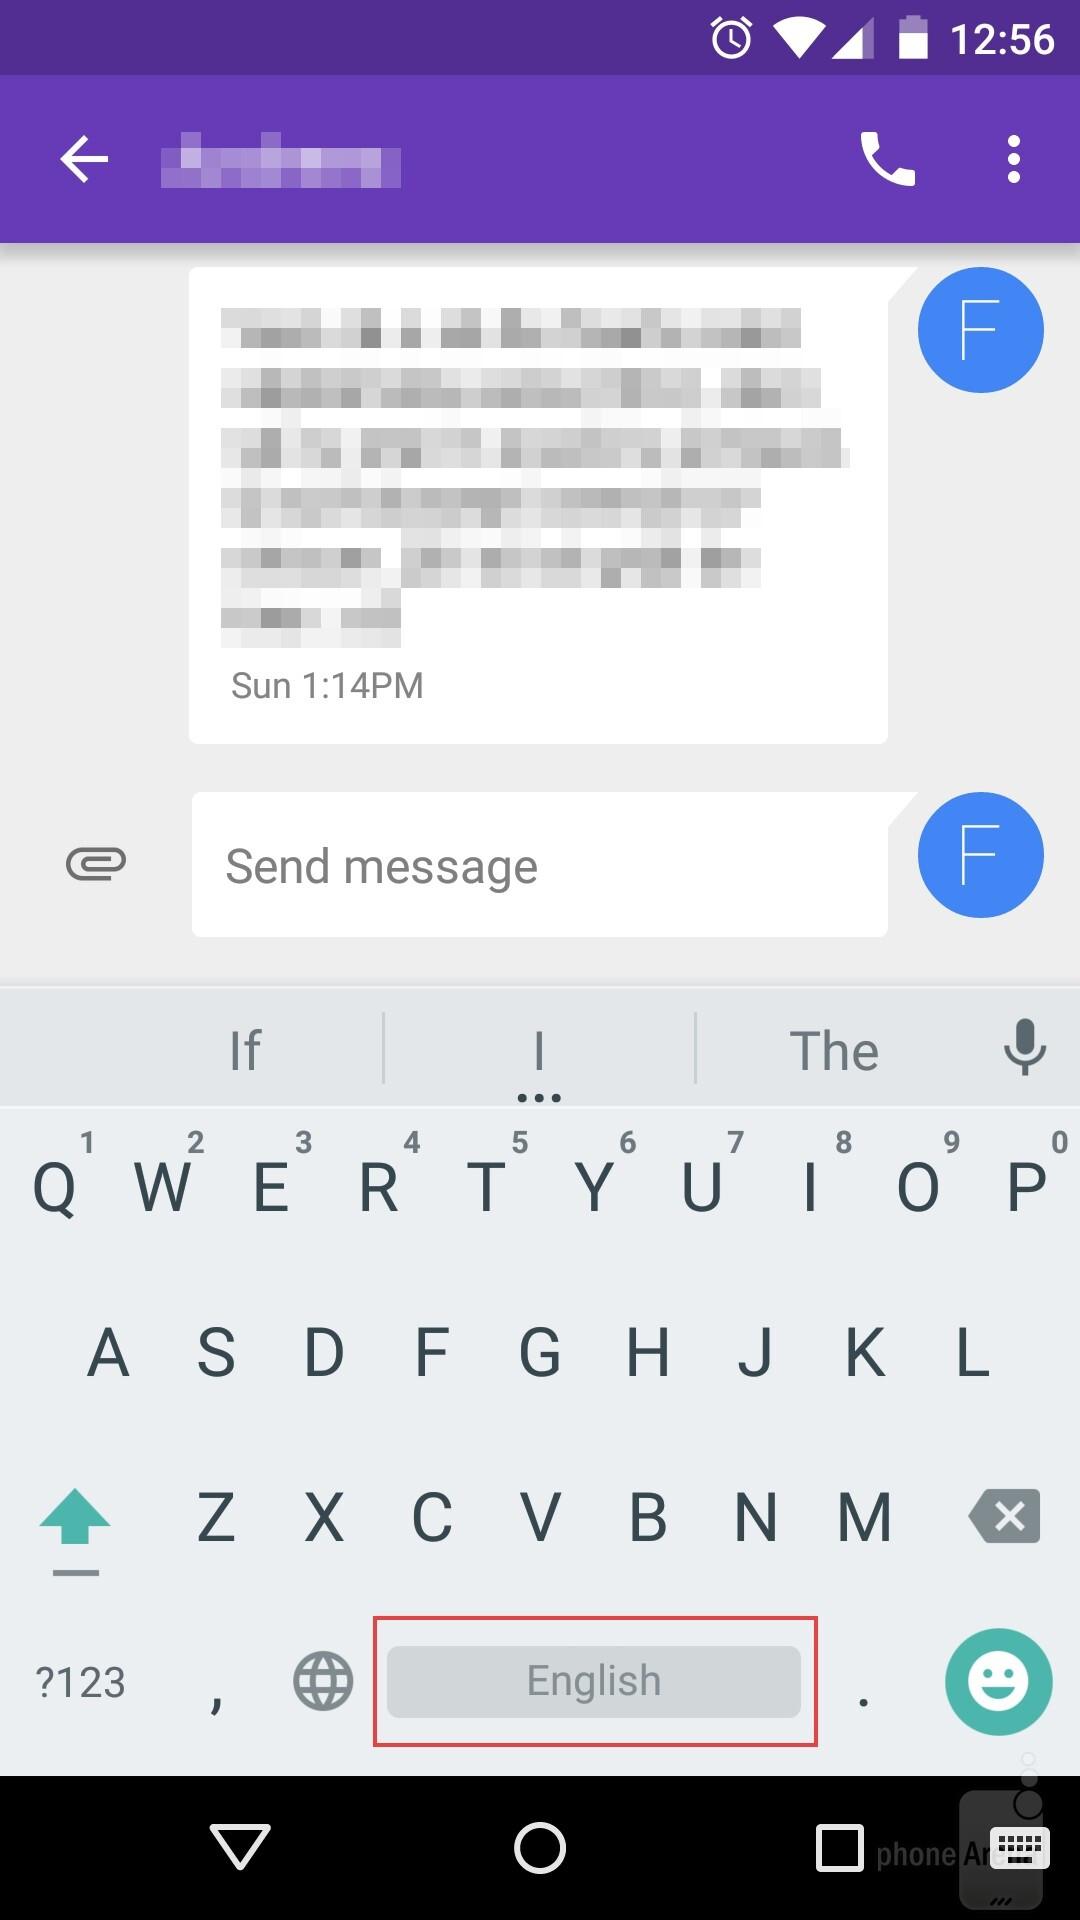 Google Handwriting Keyboard Download : how to use google 39 s handwriting input keyboard on your android phone or tablet ~ Vivirlamusica.com Haus und Dekorationen